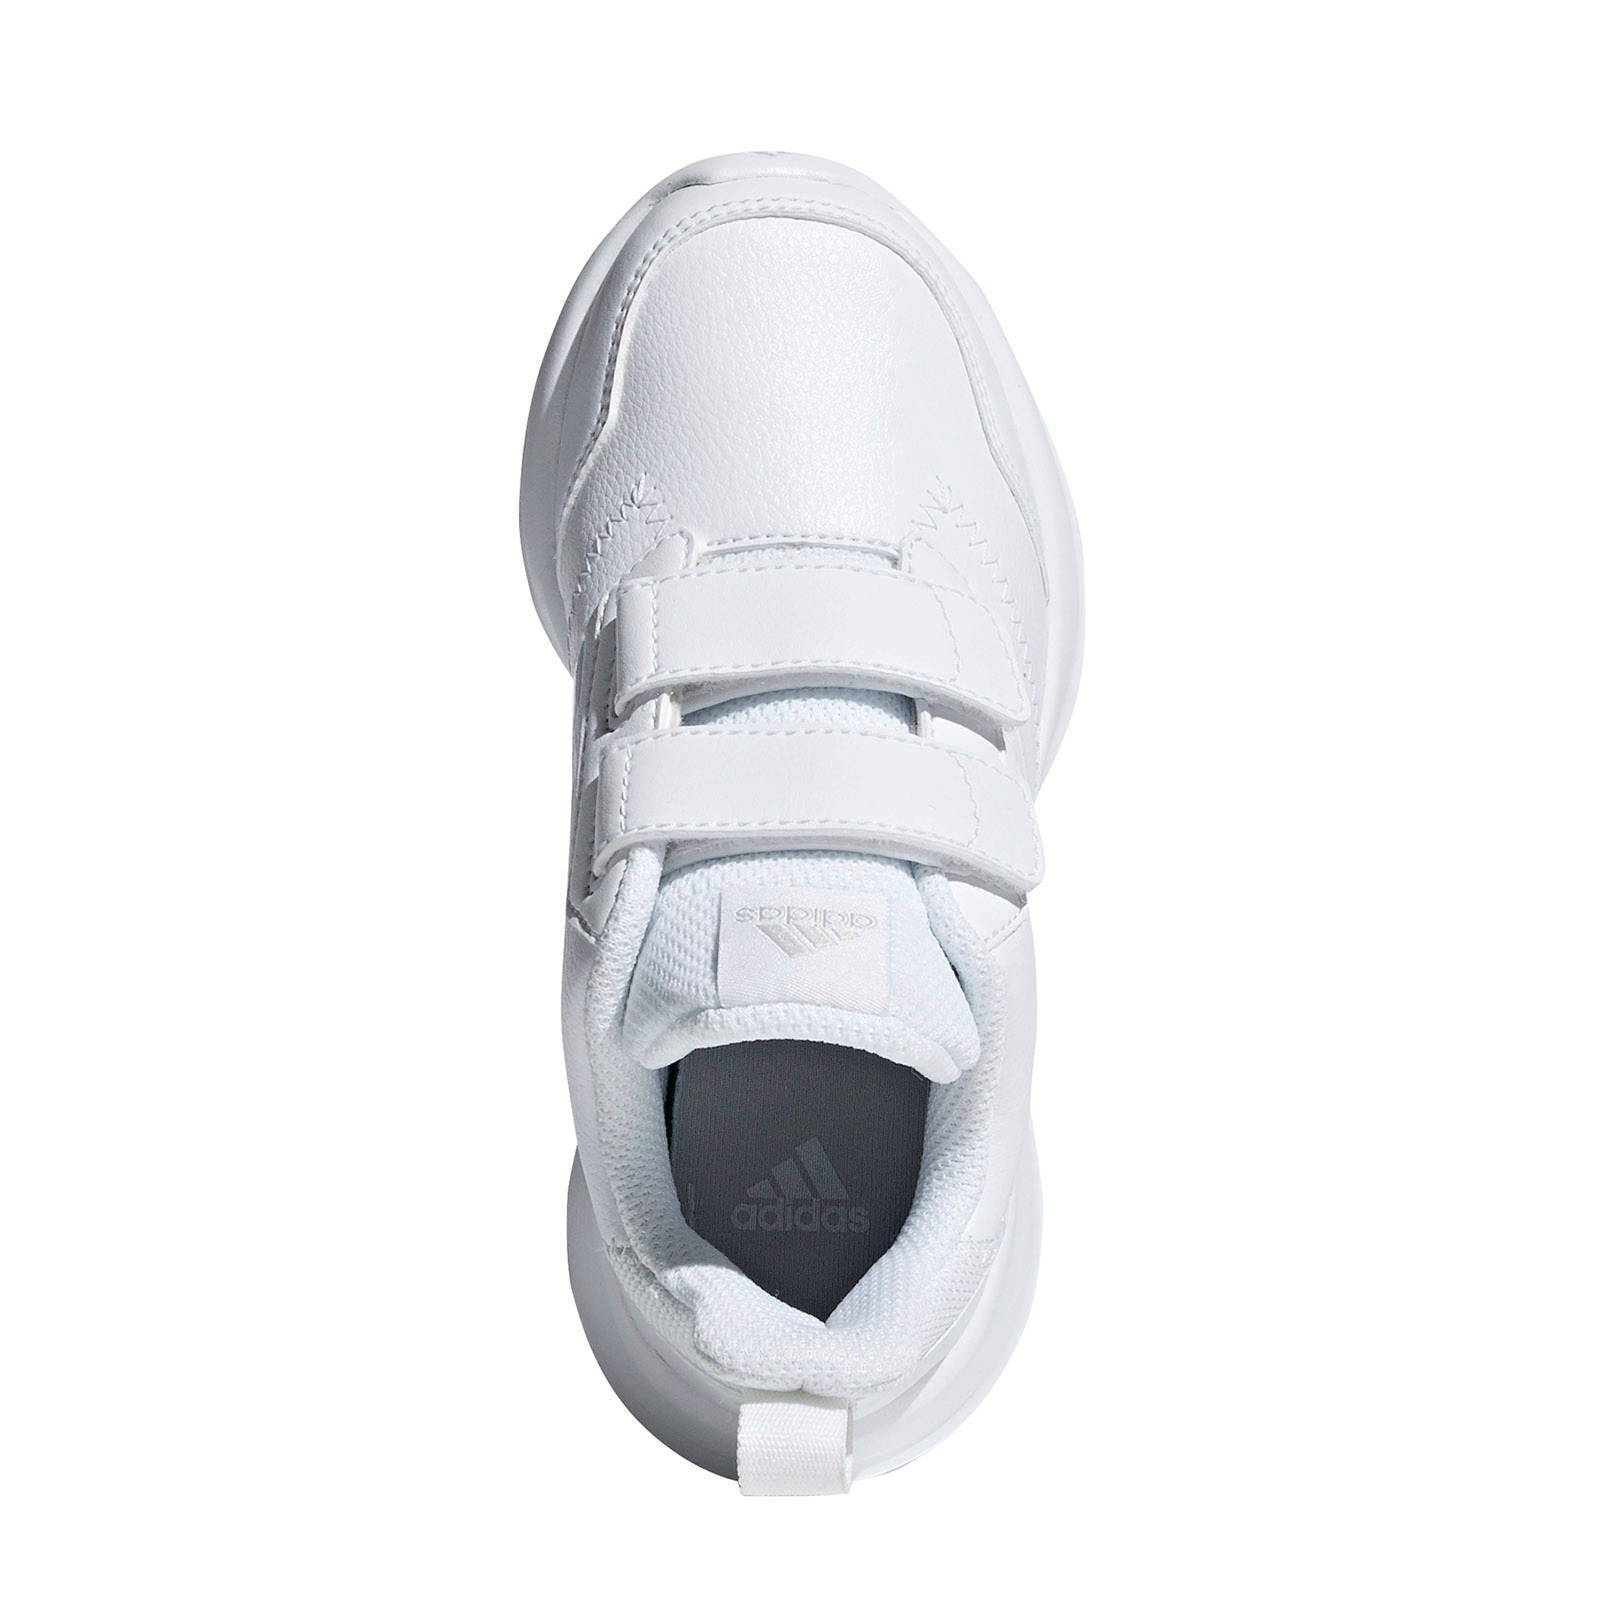 adidas Performance AltaRun CF K sportschoenen wit kids | wehkamp